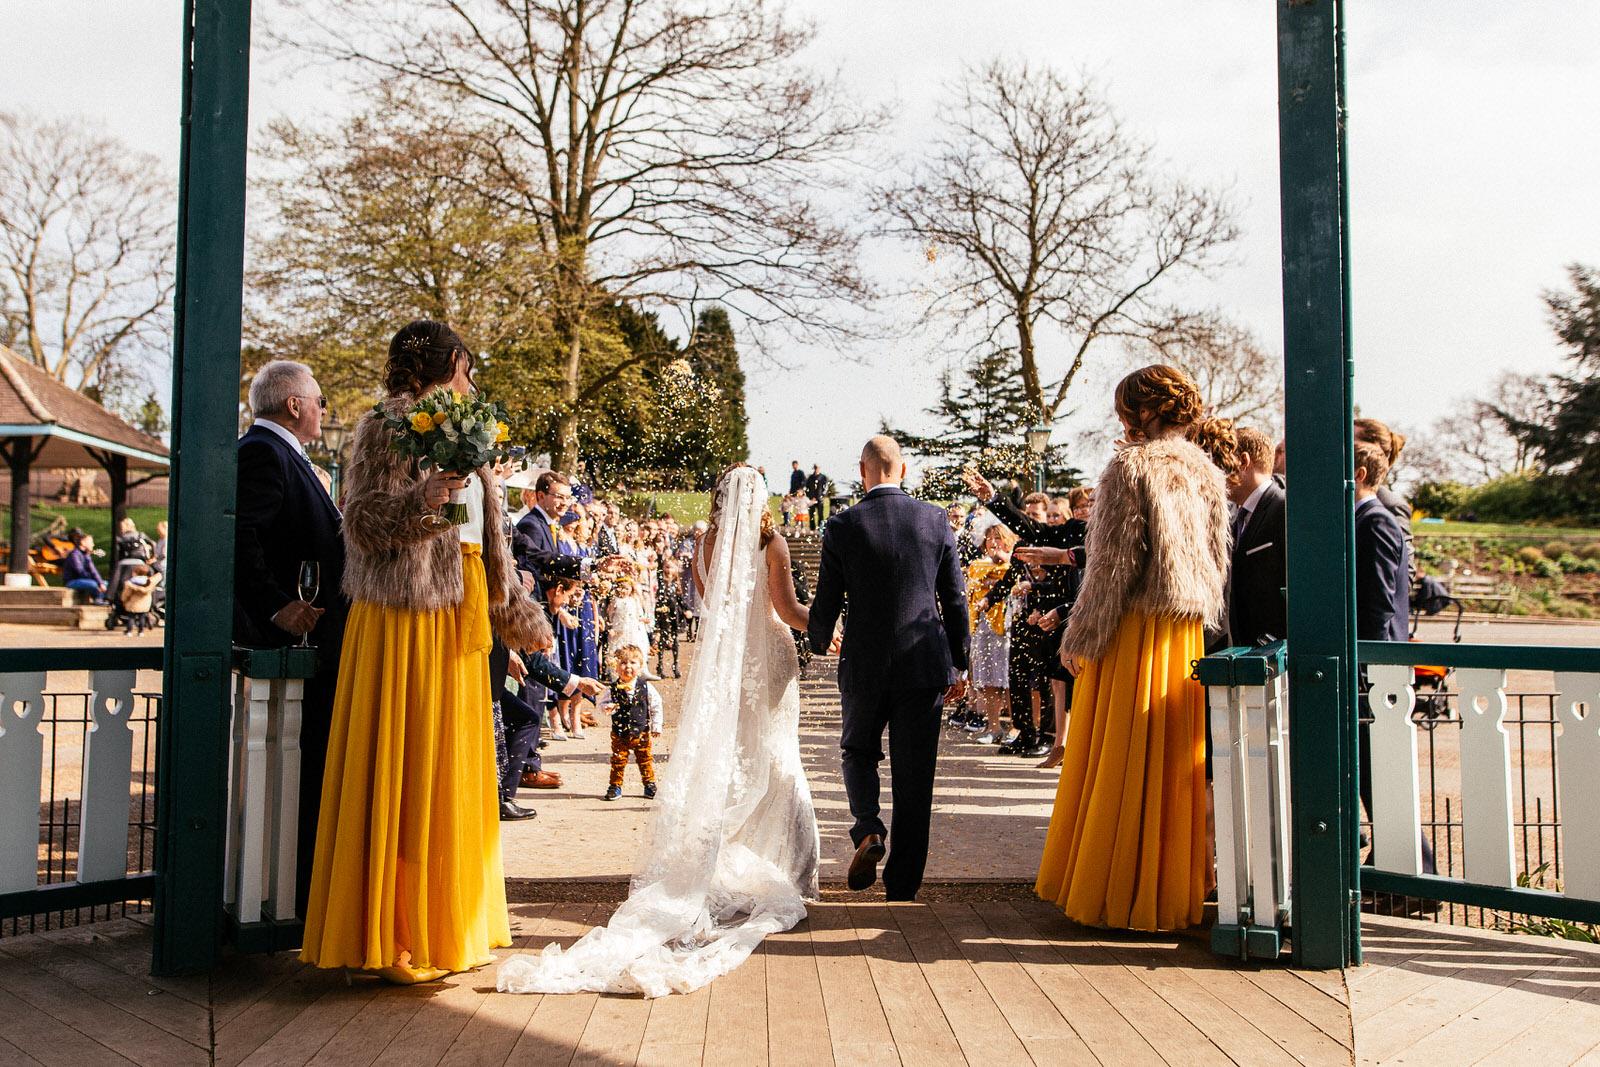 Jenni-and-James-Wedding-Highlights-24.jpg